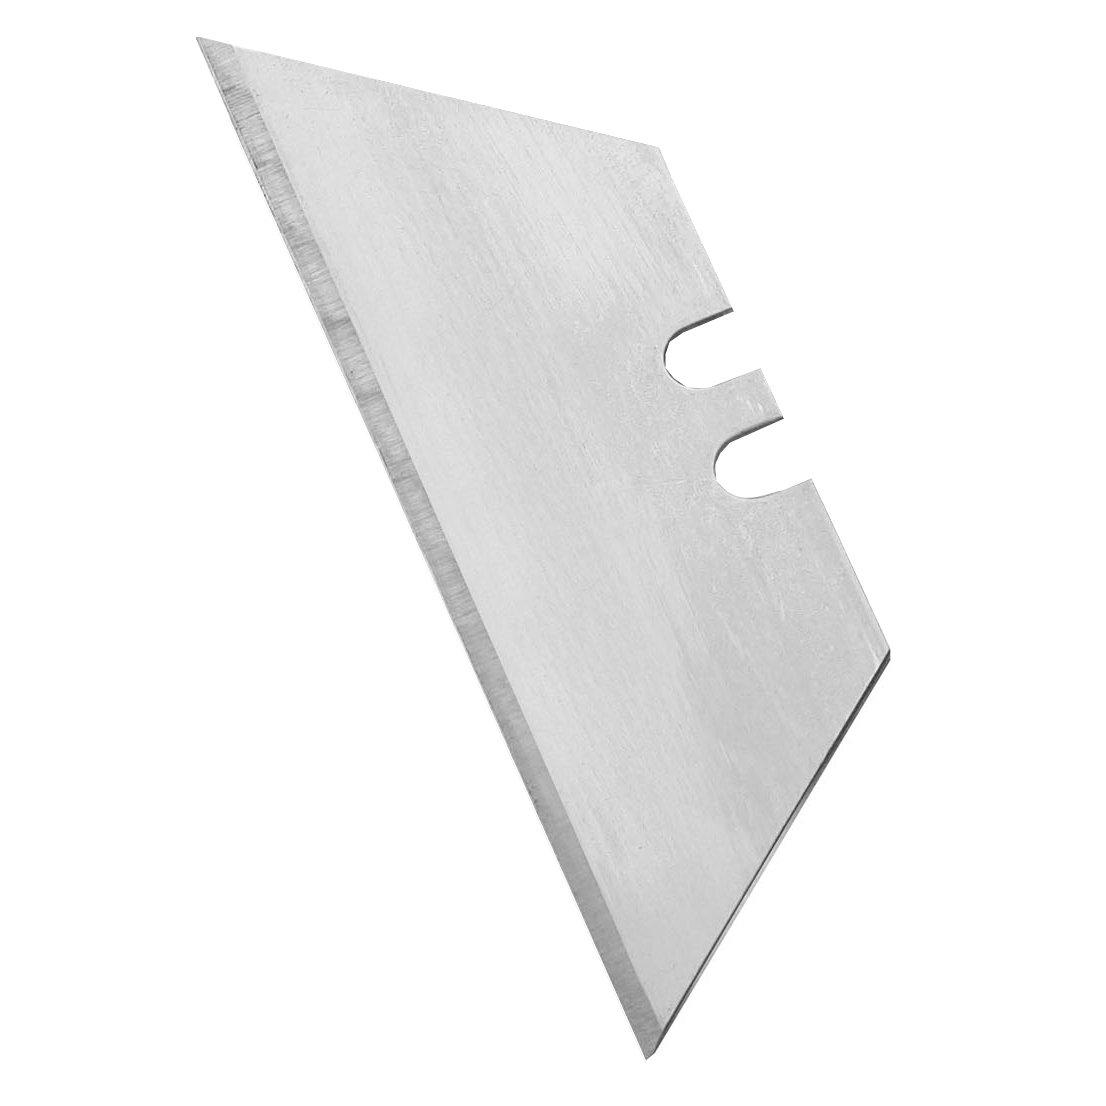 TOLSEN HU61 - Pack de 10 cuchillas de recambio para cú ter, SK5 (61 x 19 mm) HU61-VCES